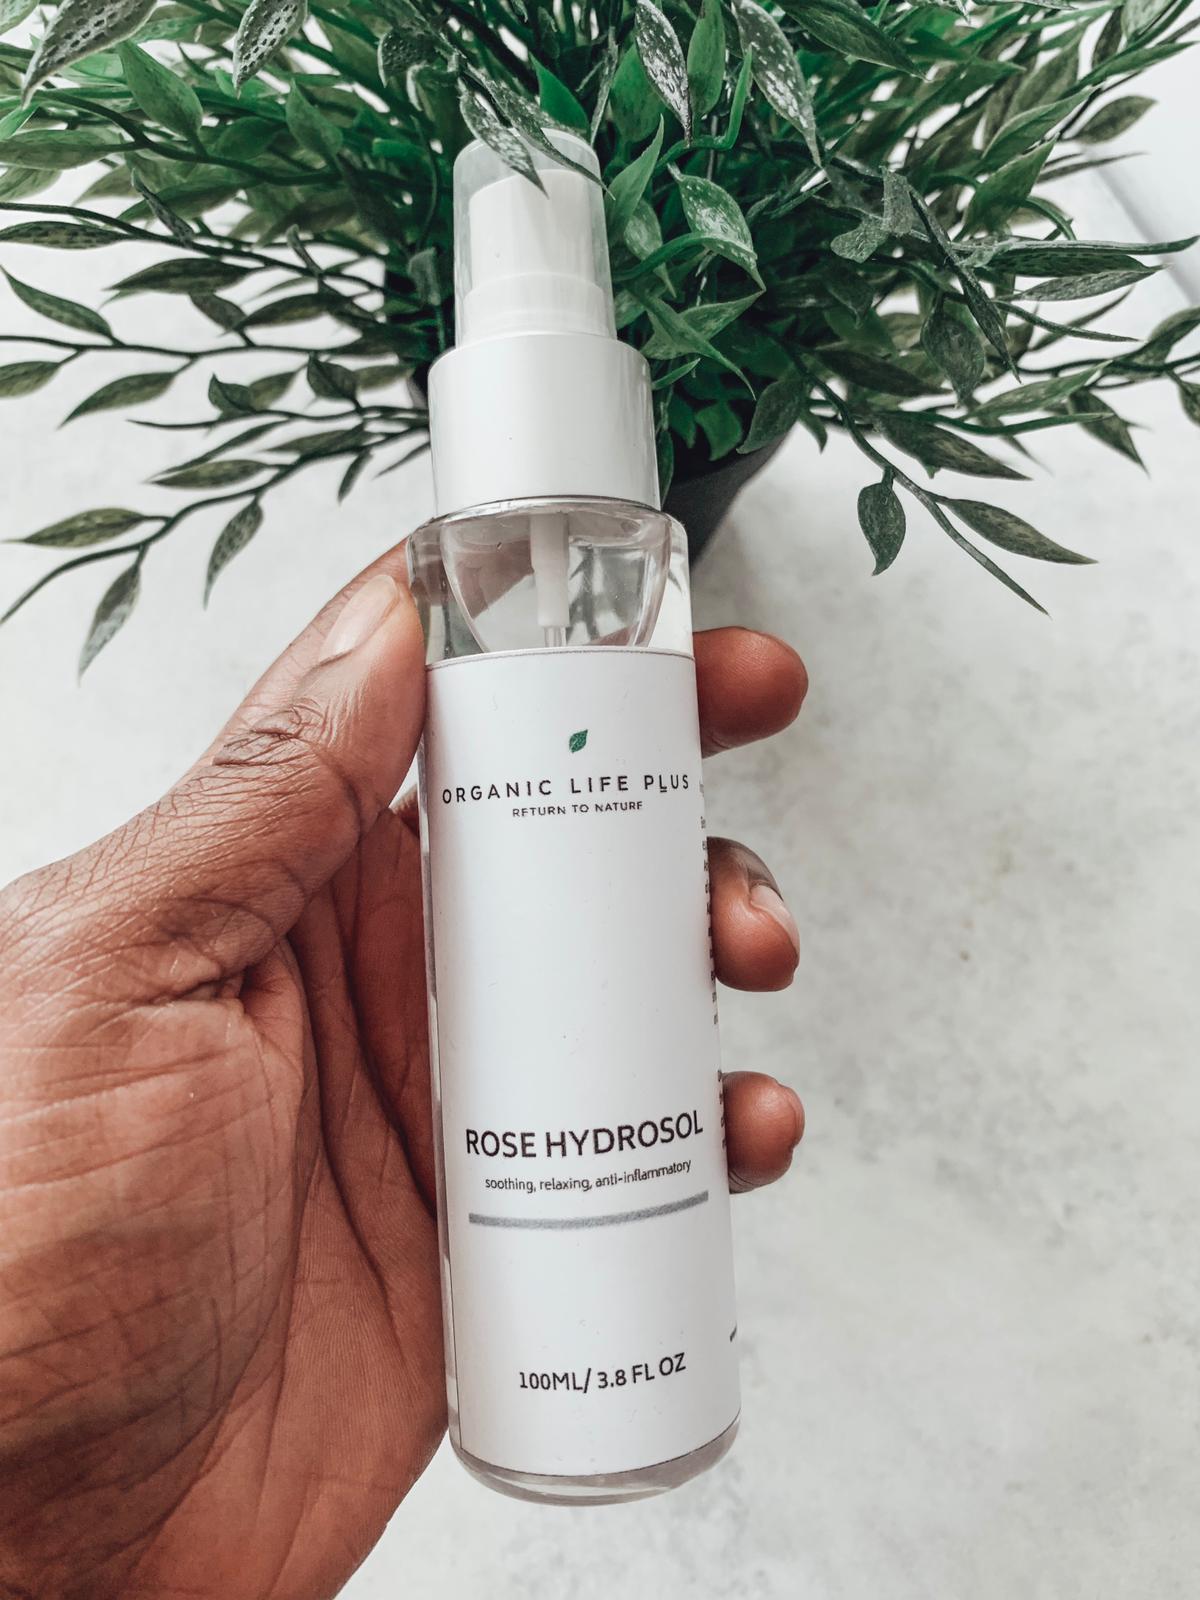 My skincare routine - organic life plus rose hydrosol